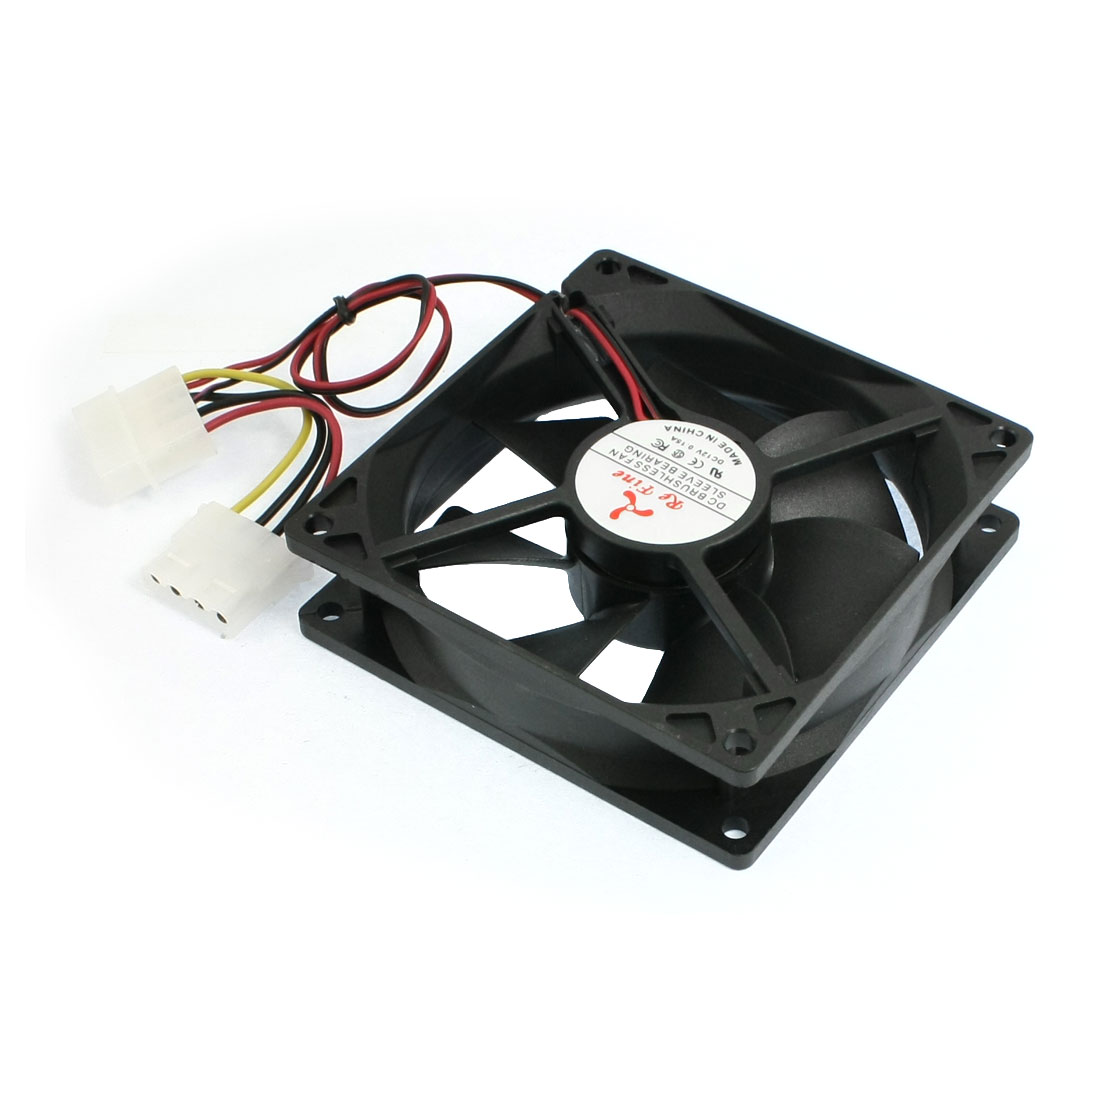 DC 12V 0.15A 4 Pins PC Computer CPU Cooler Cooling Fan 92mm x 25mm